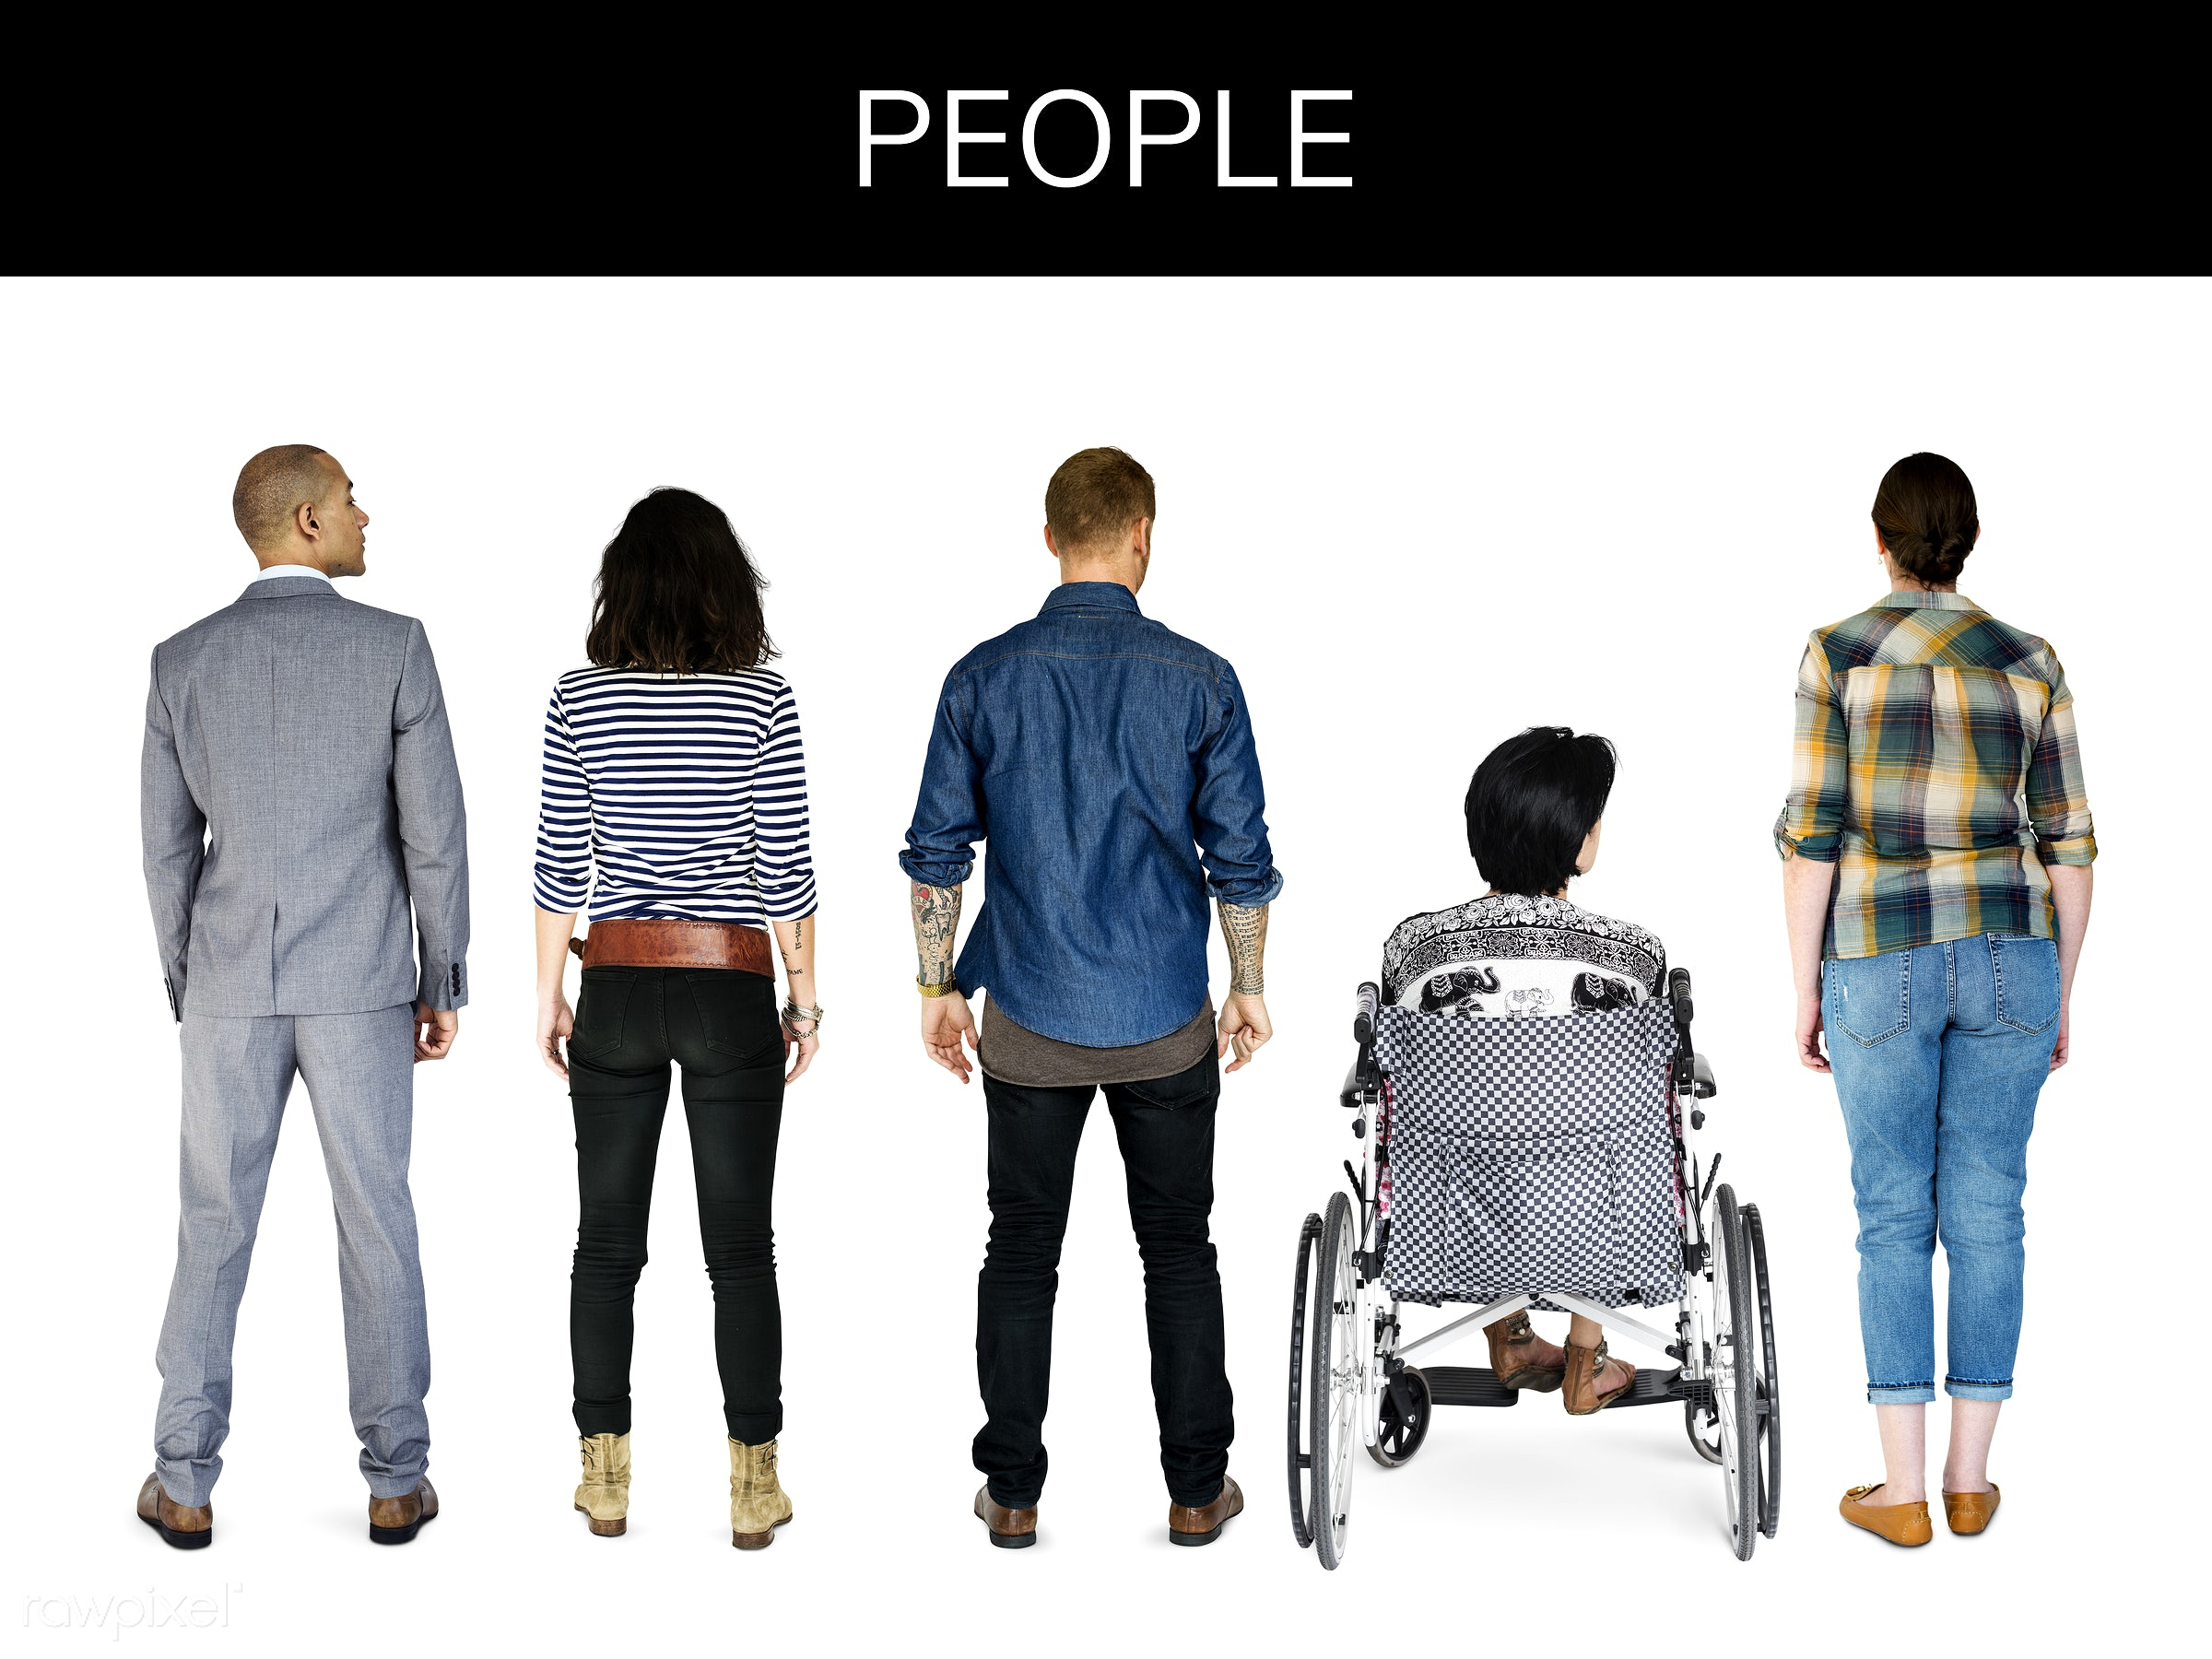 studio, gentlemen, person, diverse, race, people, together, attraction, caucasian, woman, lifestyle, mixed race, studio...